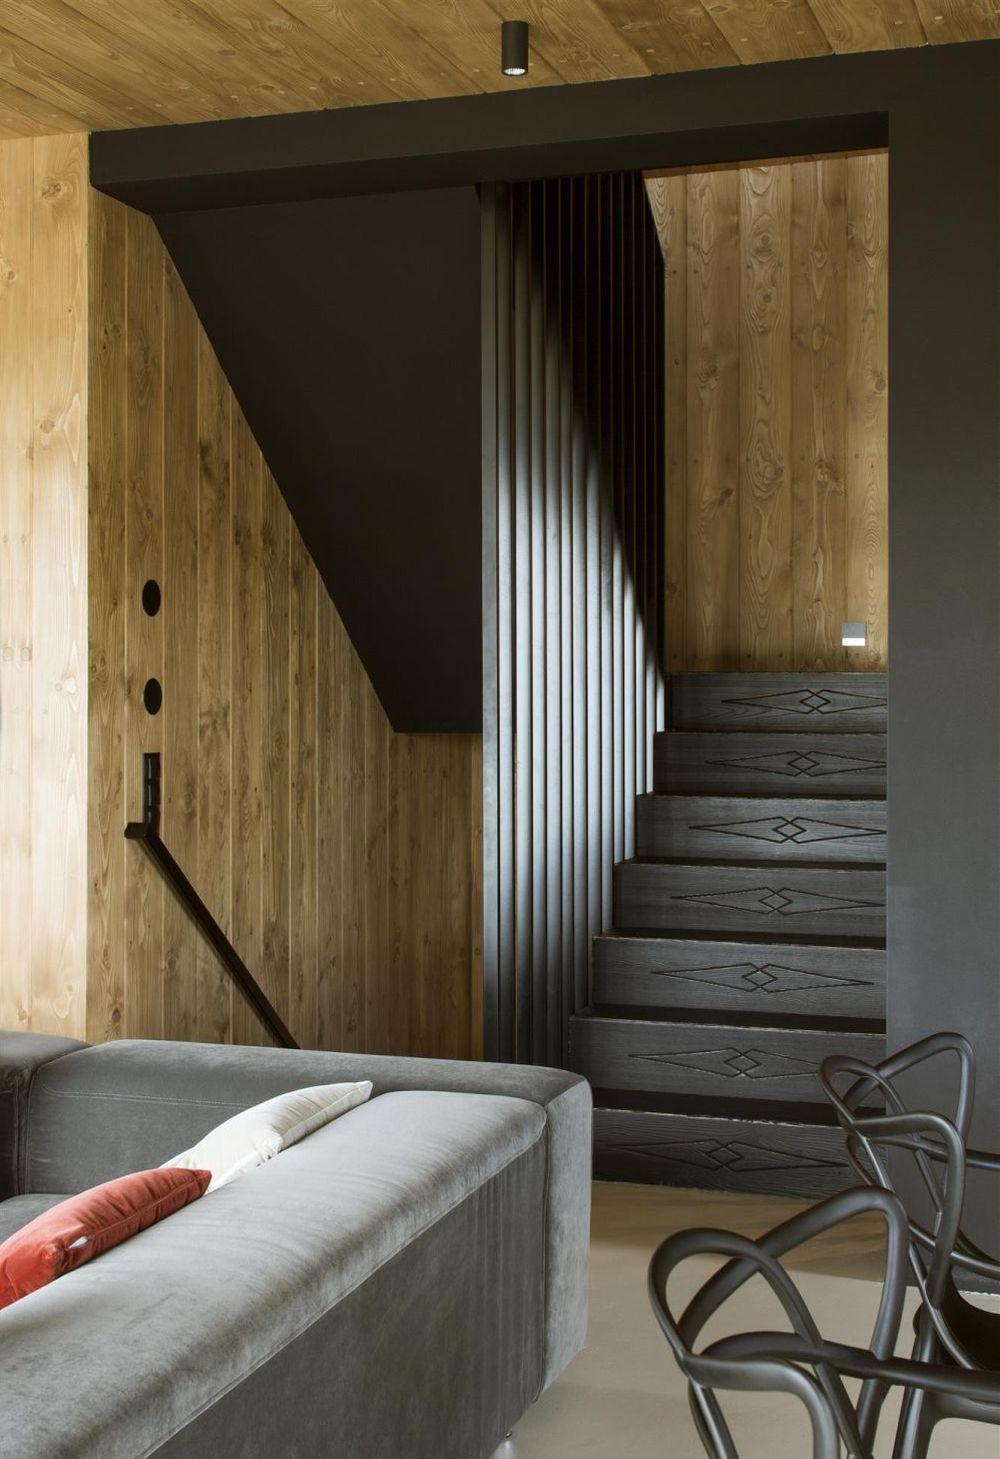 adelaparvu.com despre casa contemporana inspirata de arhitectura traditionala, Design Hola Design Studio, arhitectura Exterior, Foto Yassen Hristov (14)